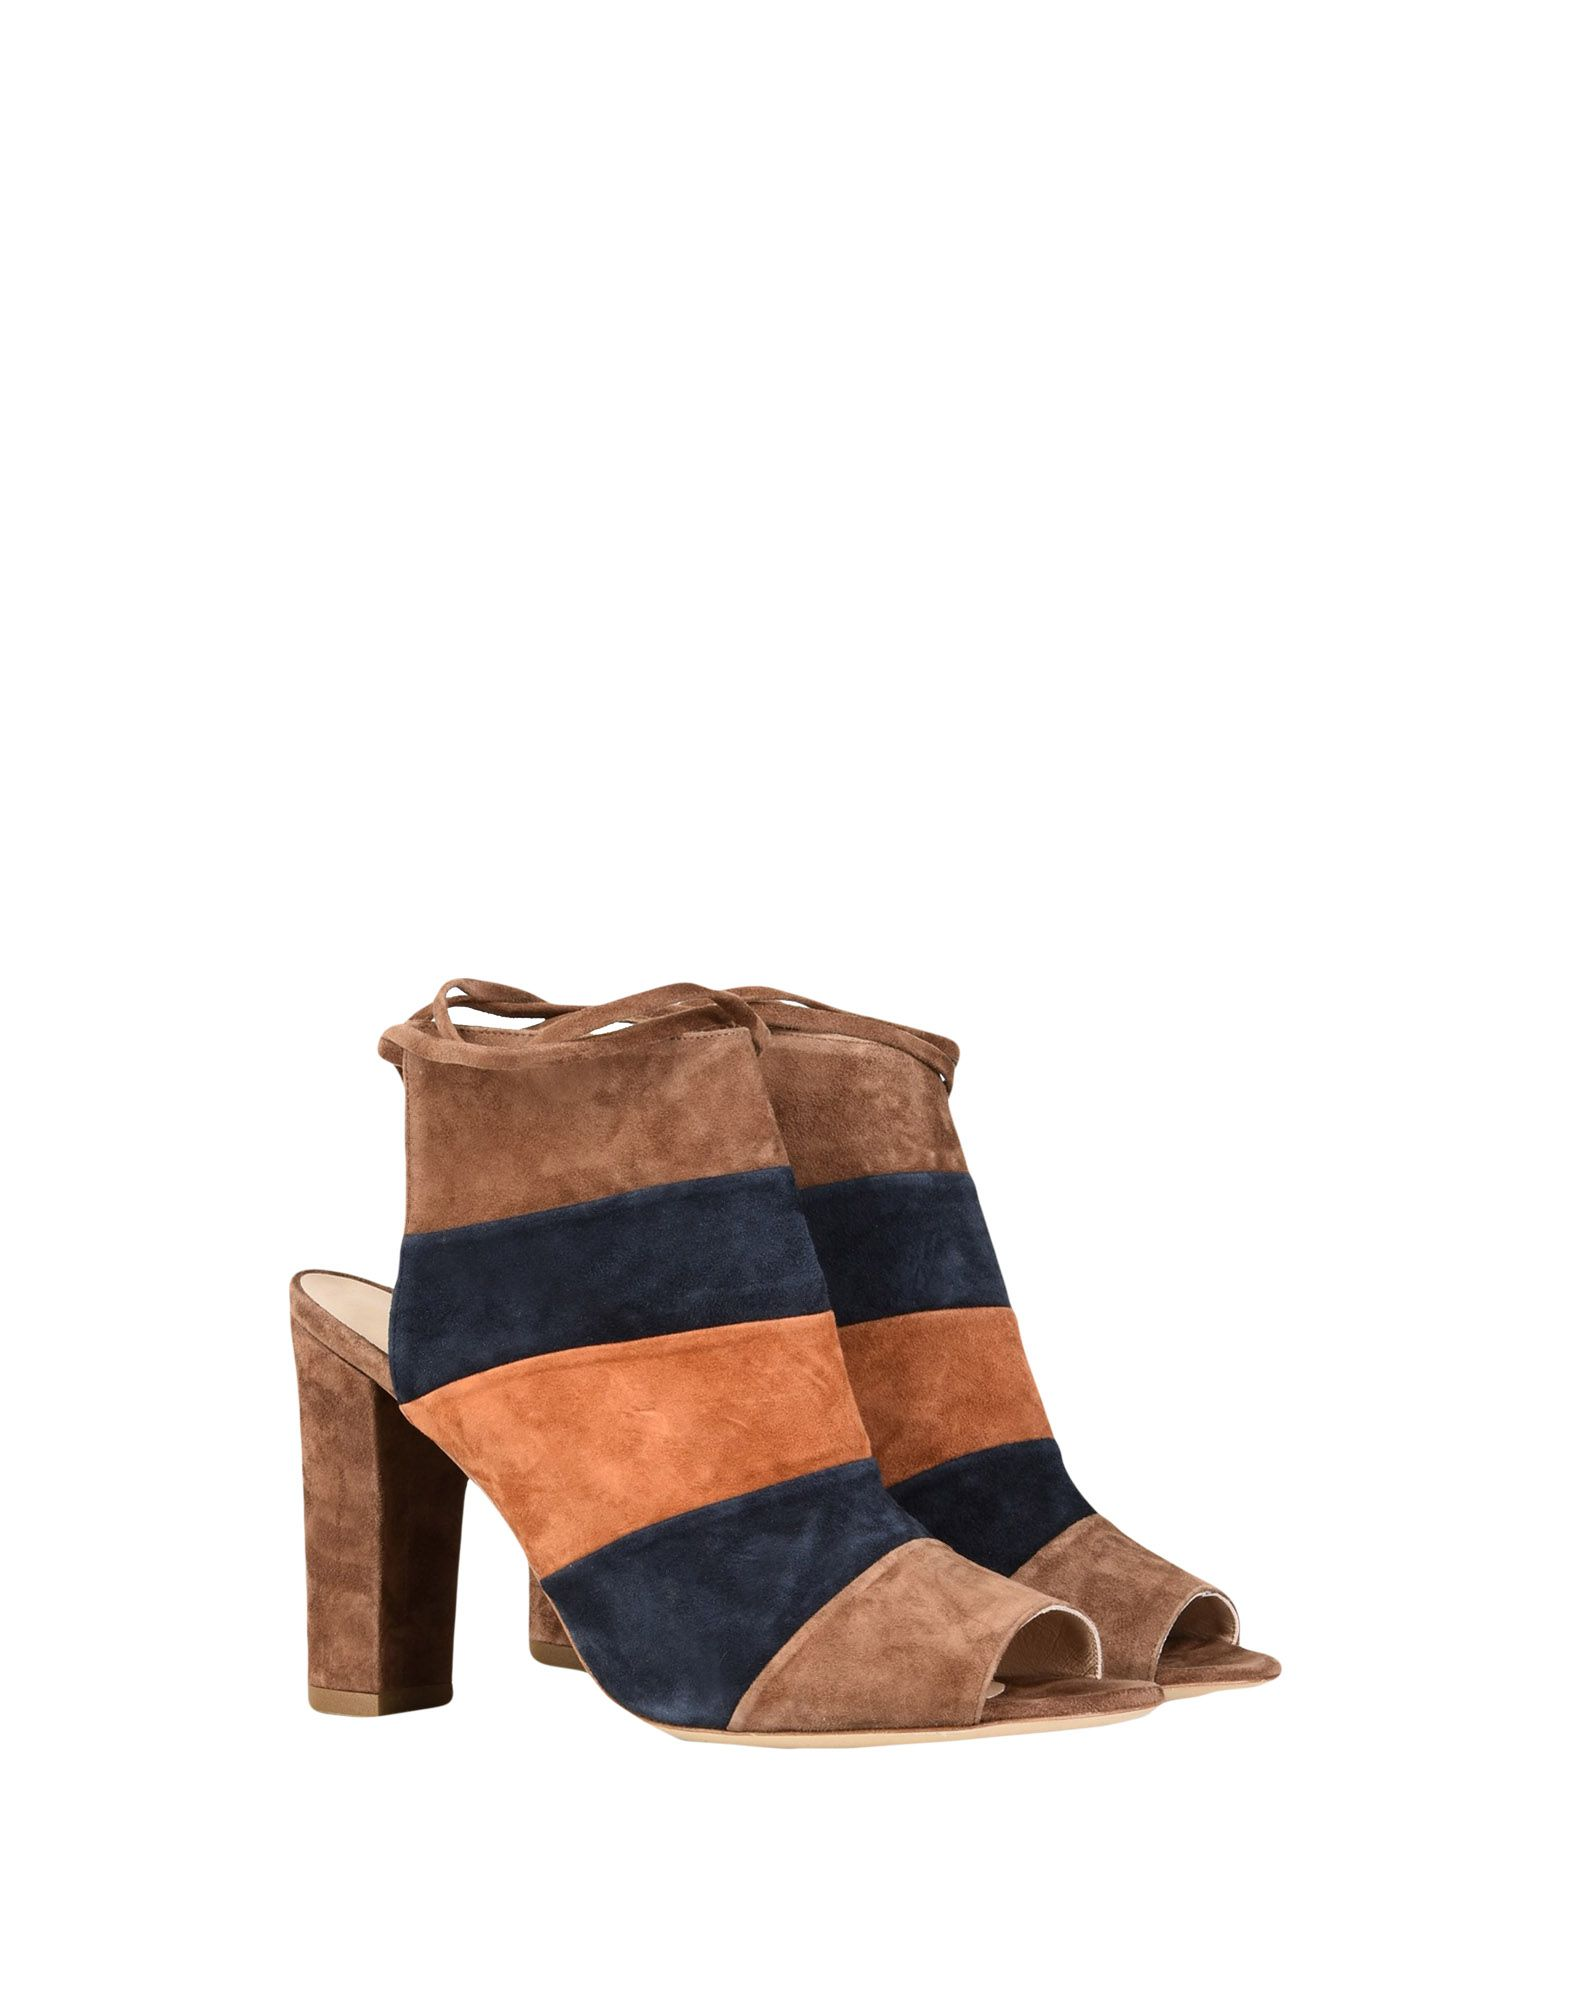 8 Sandalen Qualität Damen  11215460HV Gute Qualität Sandalen beliebte Schuhe da00ab